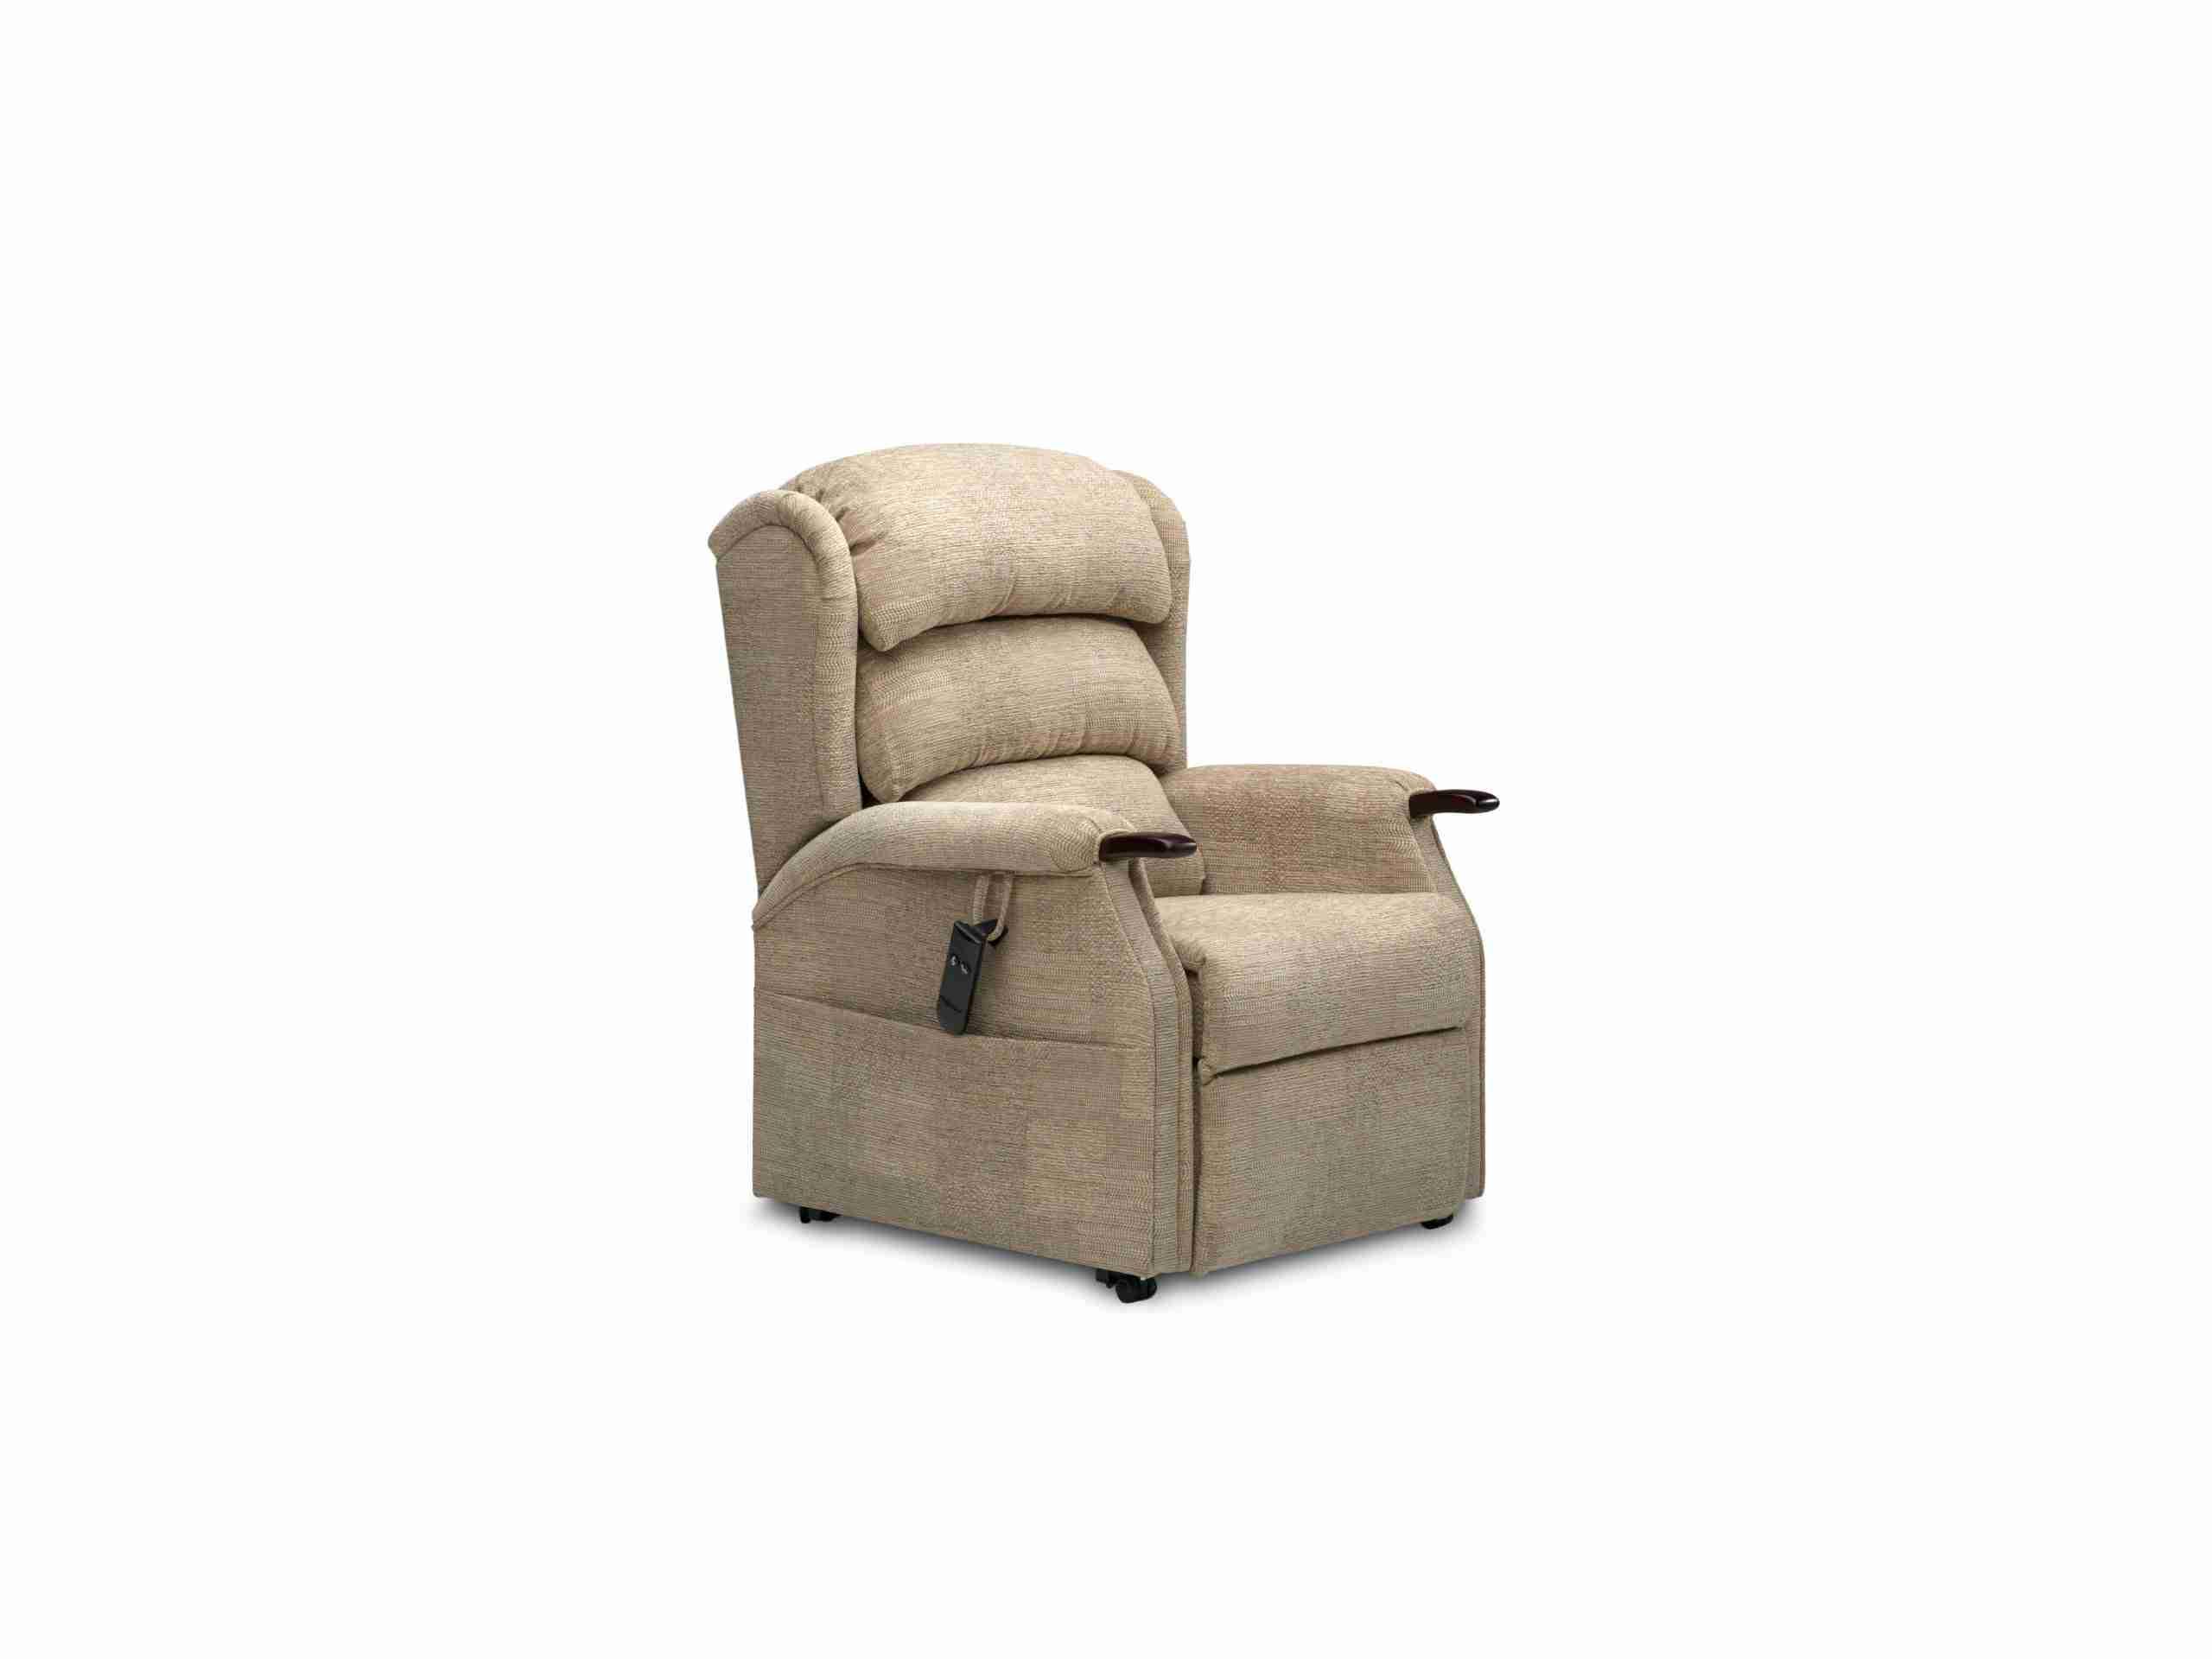 Rimini Chair WA Repose002